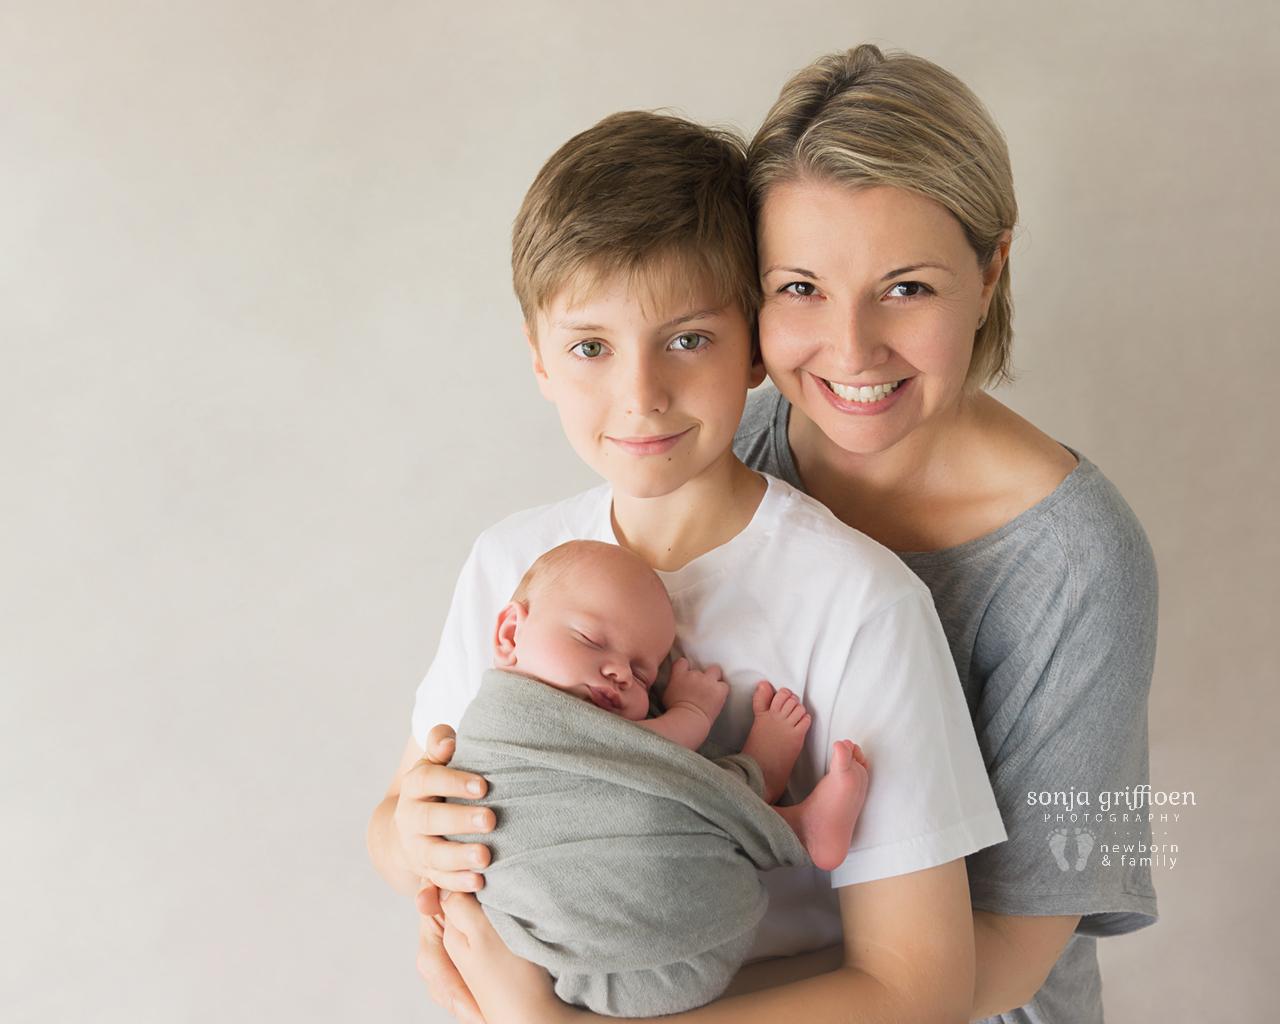 Cooper-Newborn-Brisbane-Newborn-Photographer-Sonja-Griffioen-12.jpg